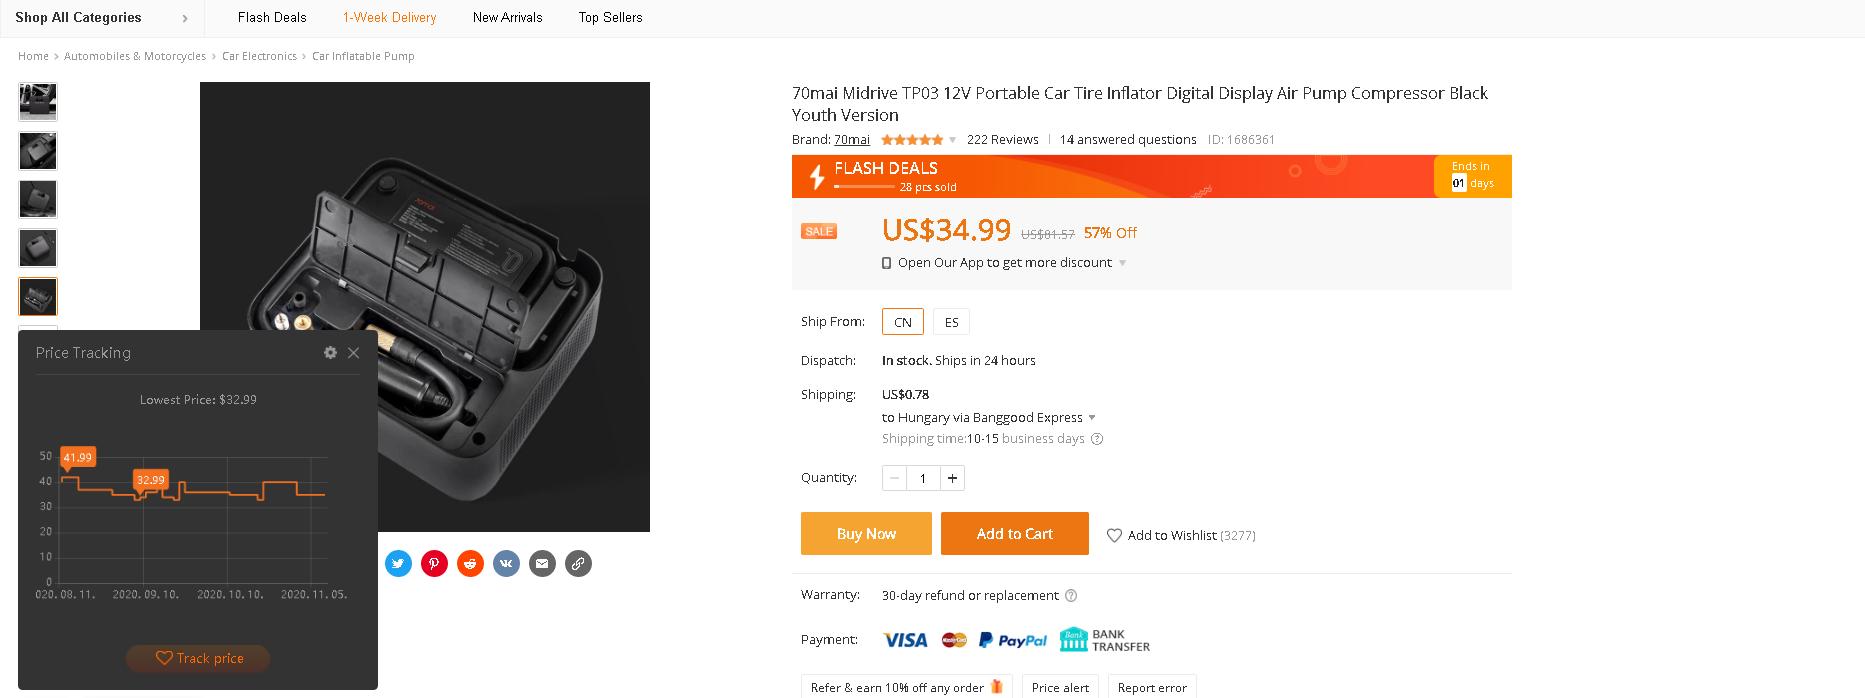 Történelmi mélyponton a Xiaomi 70mai autós pumpa ára 7